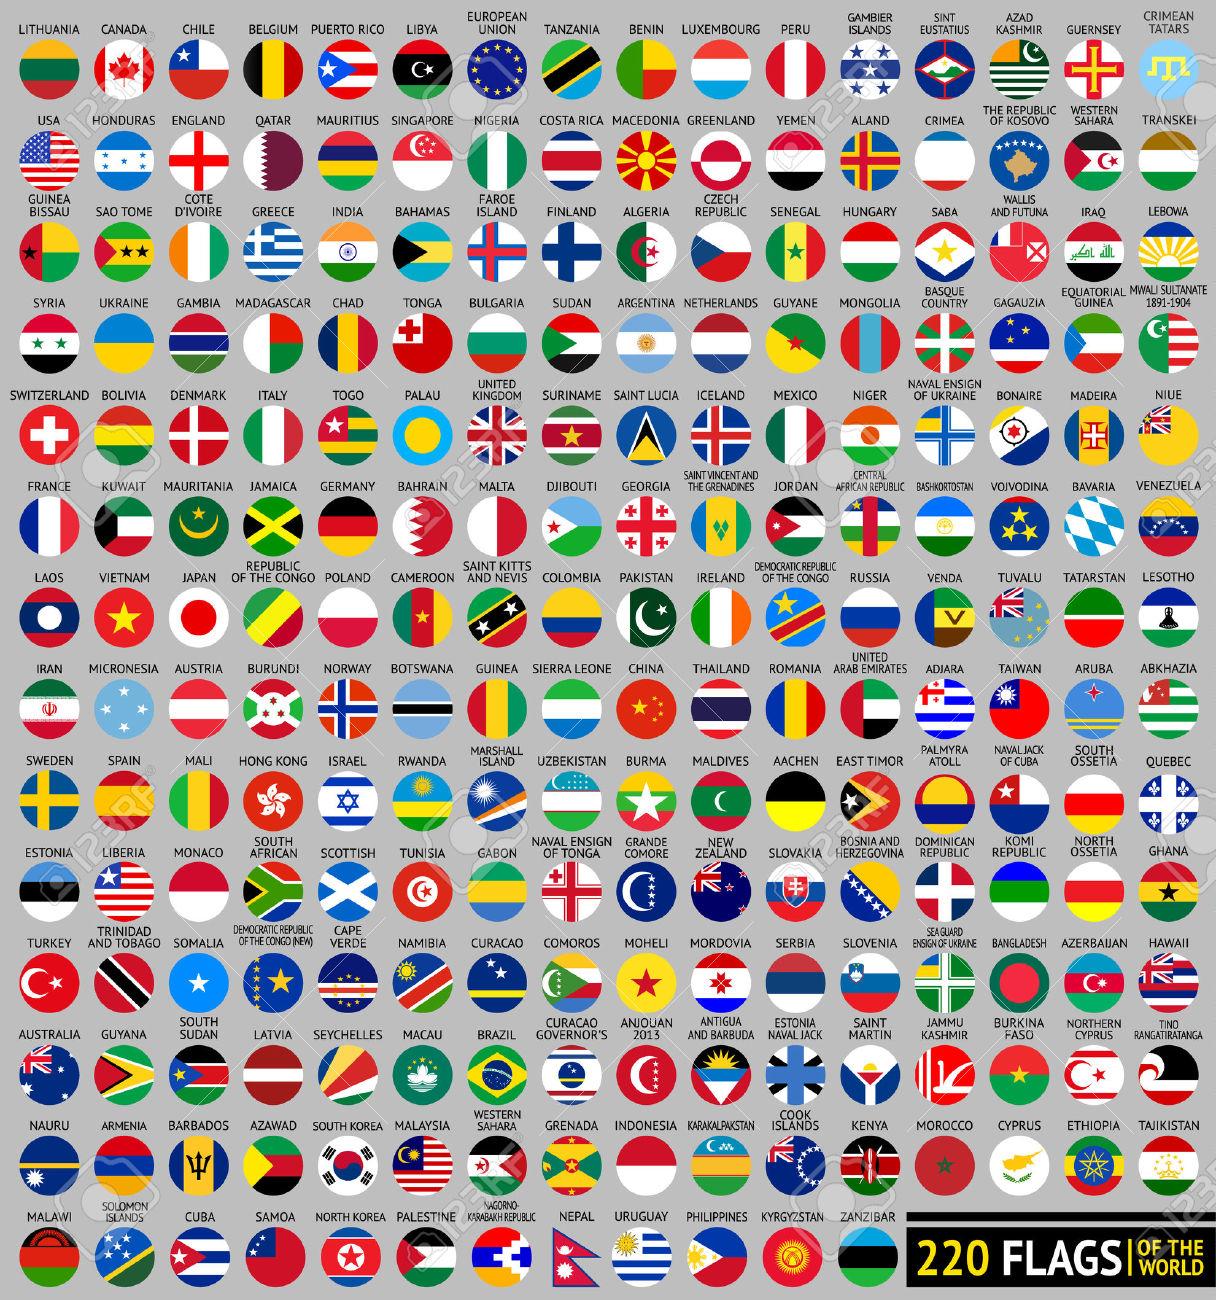 220 Flags Of The World, Circular Shape, Flat Vector Illustration.